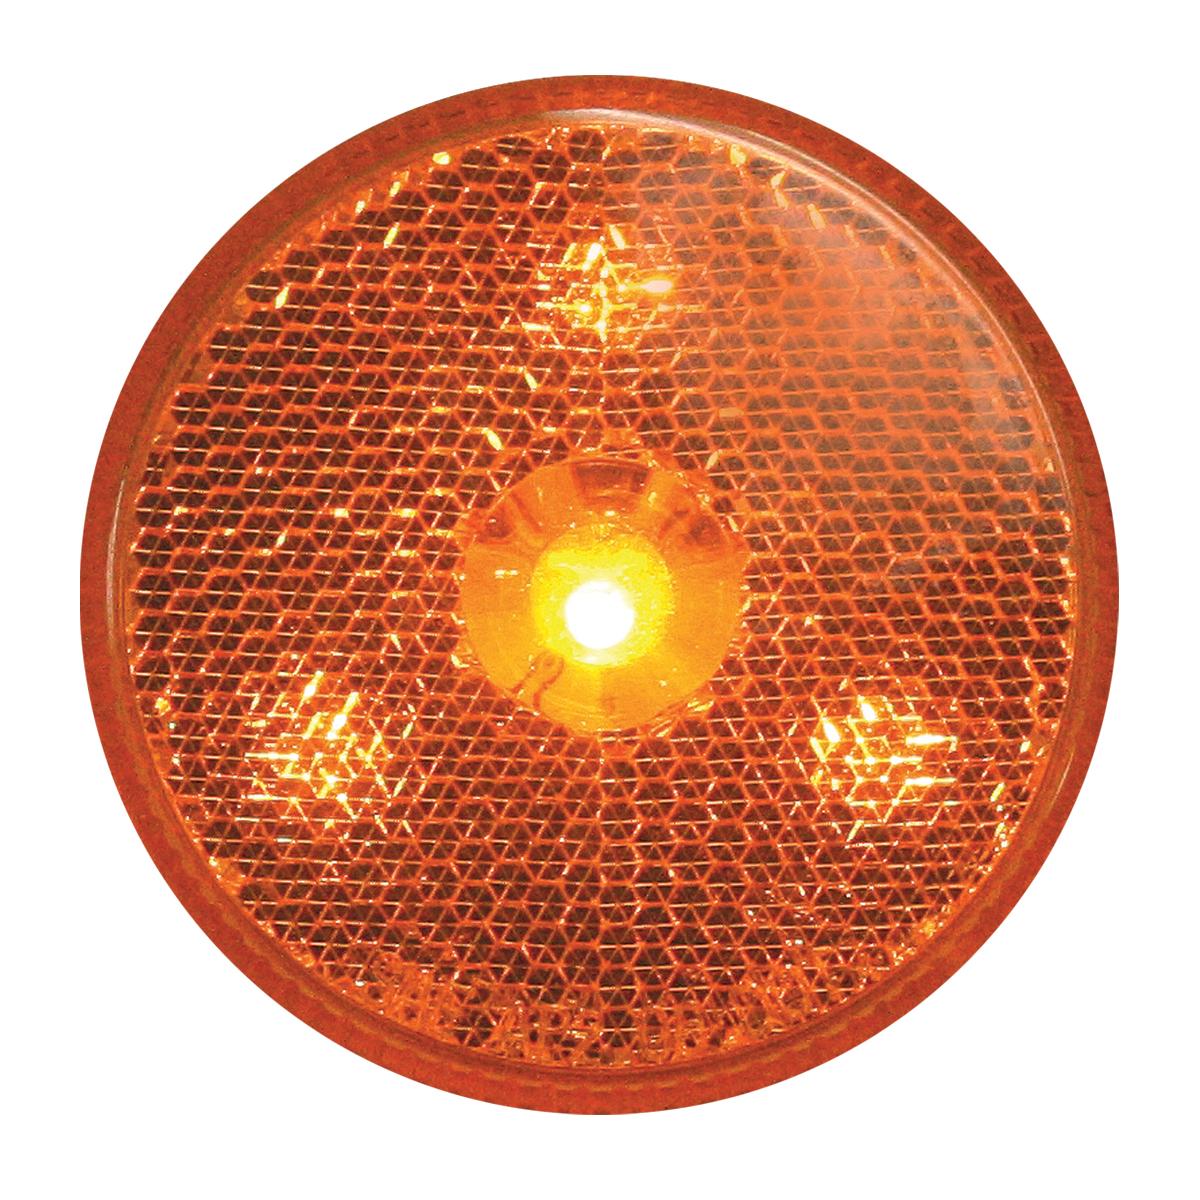 "76970 2.5"" Reflector Style LED Maker Light in Amber/Amber"